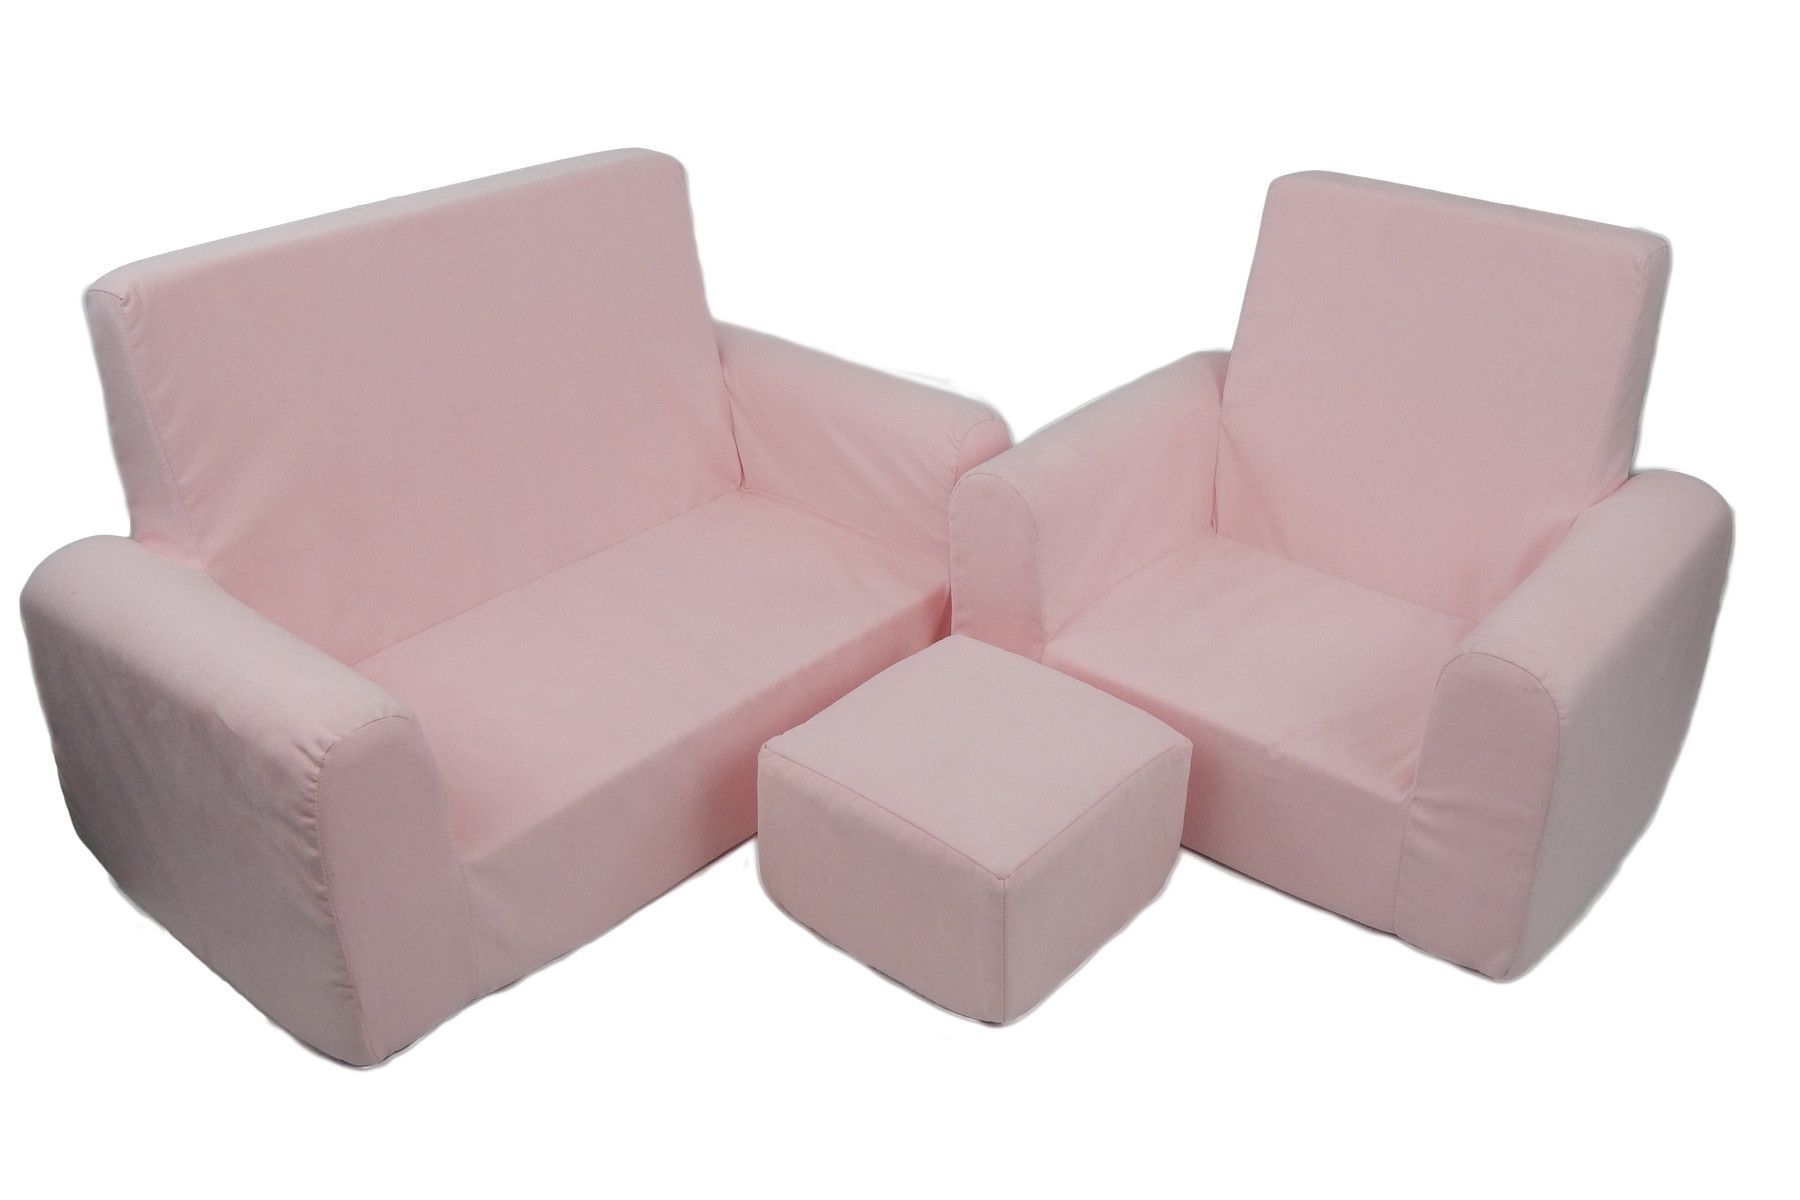 3 Piece Kids Sofa Chair And Ottoman Set Muebles